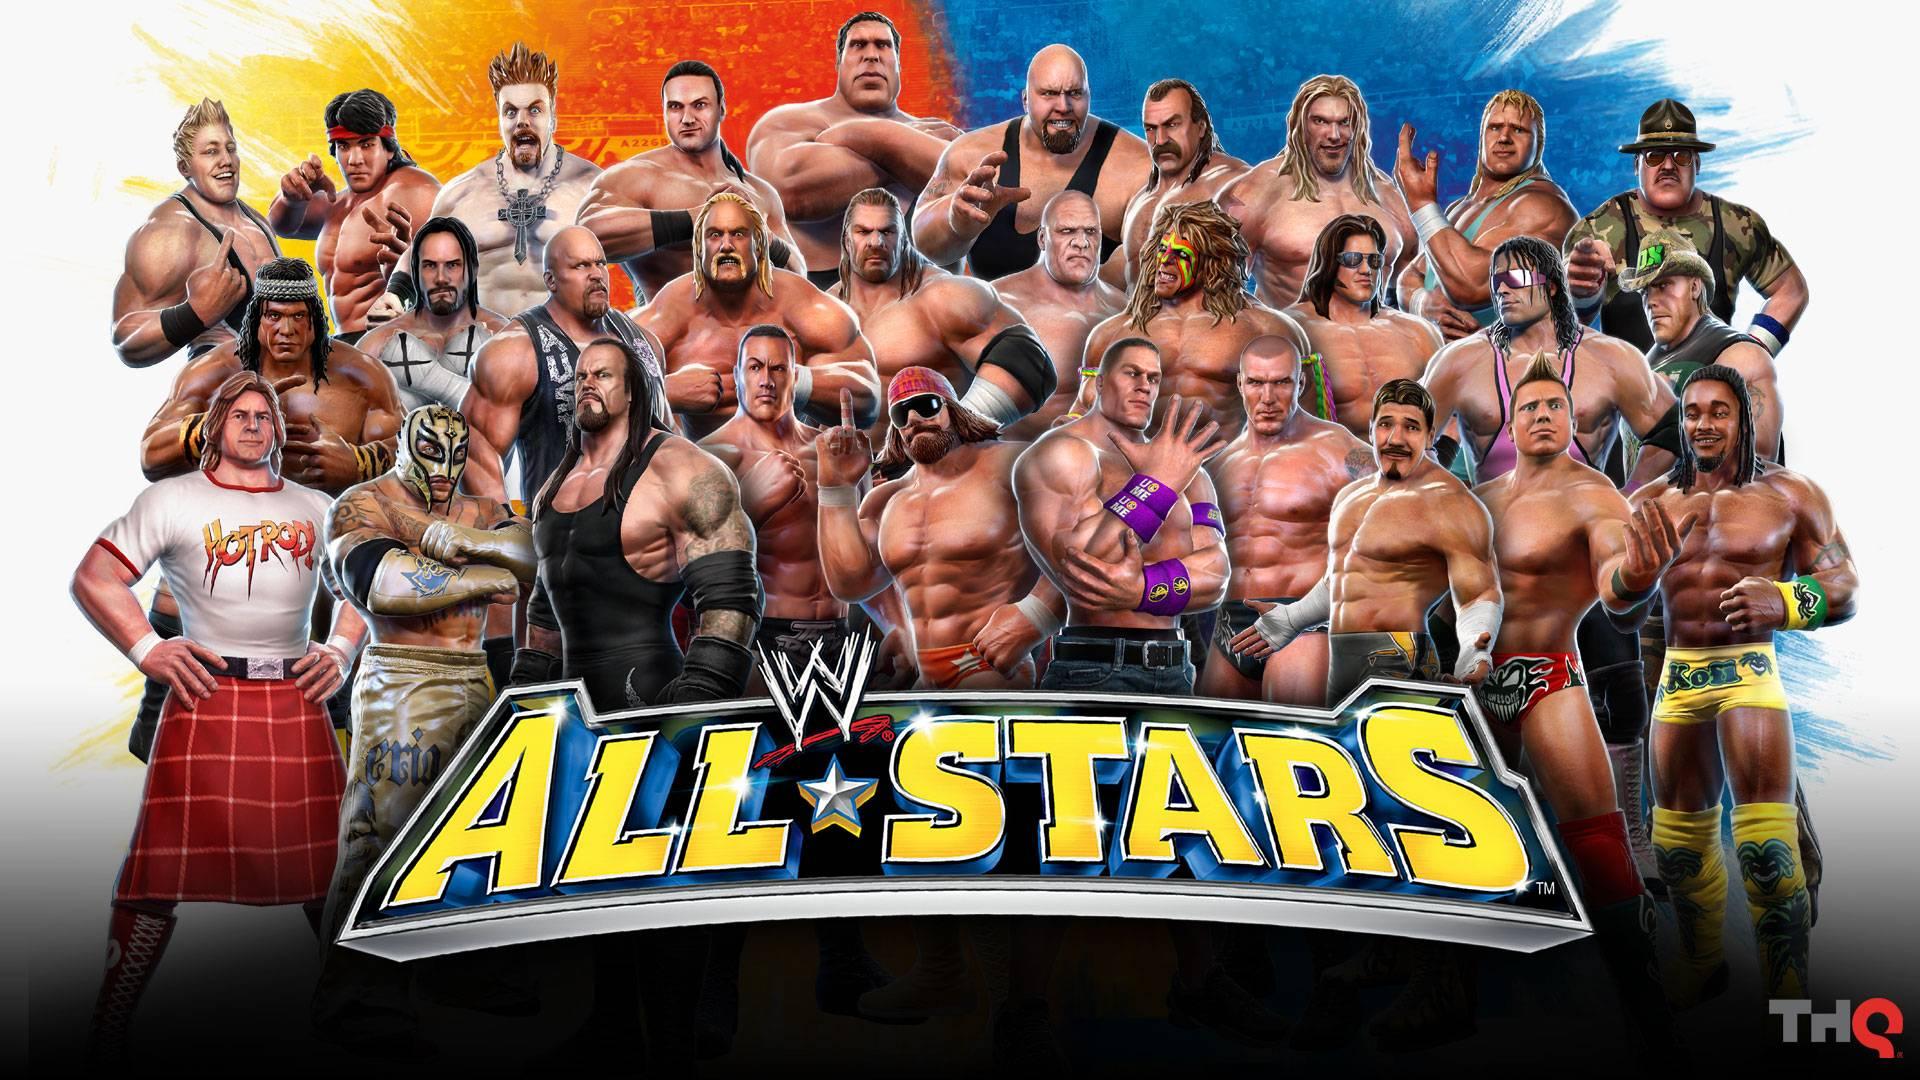 ALL STARS   WWE Smackdown Wallpaper 1920x1080